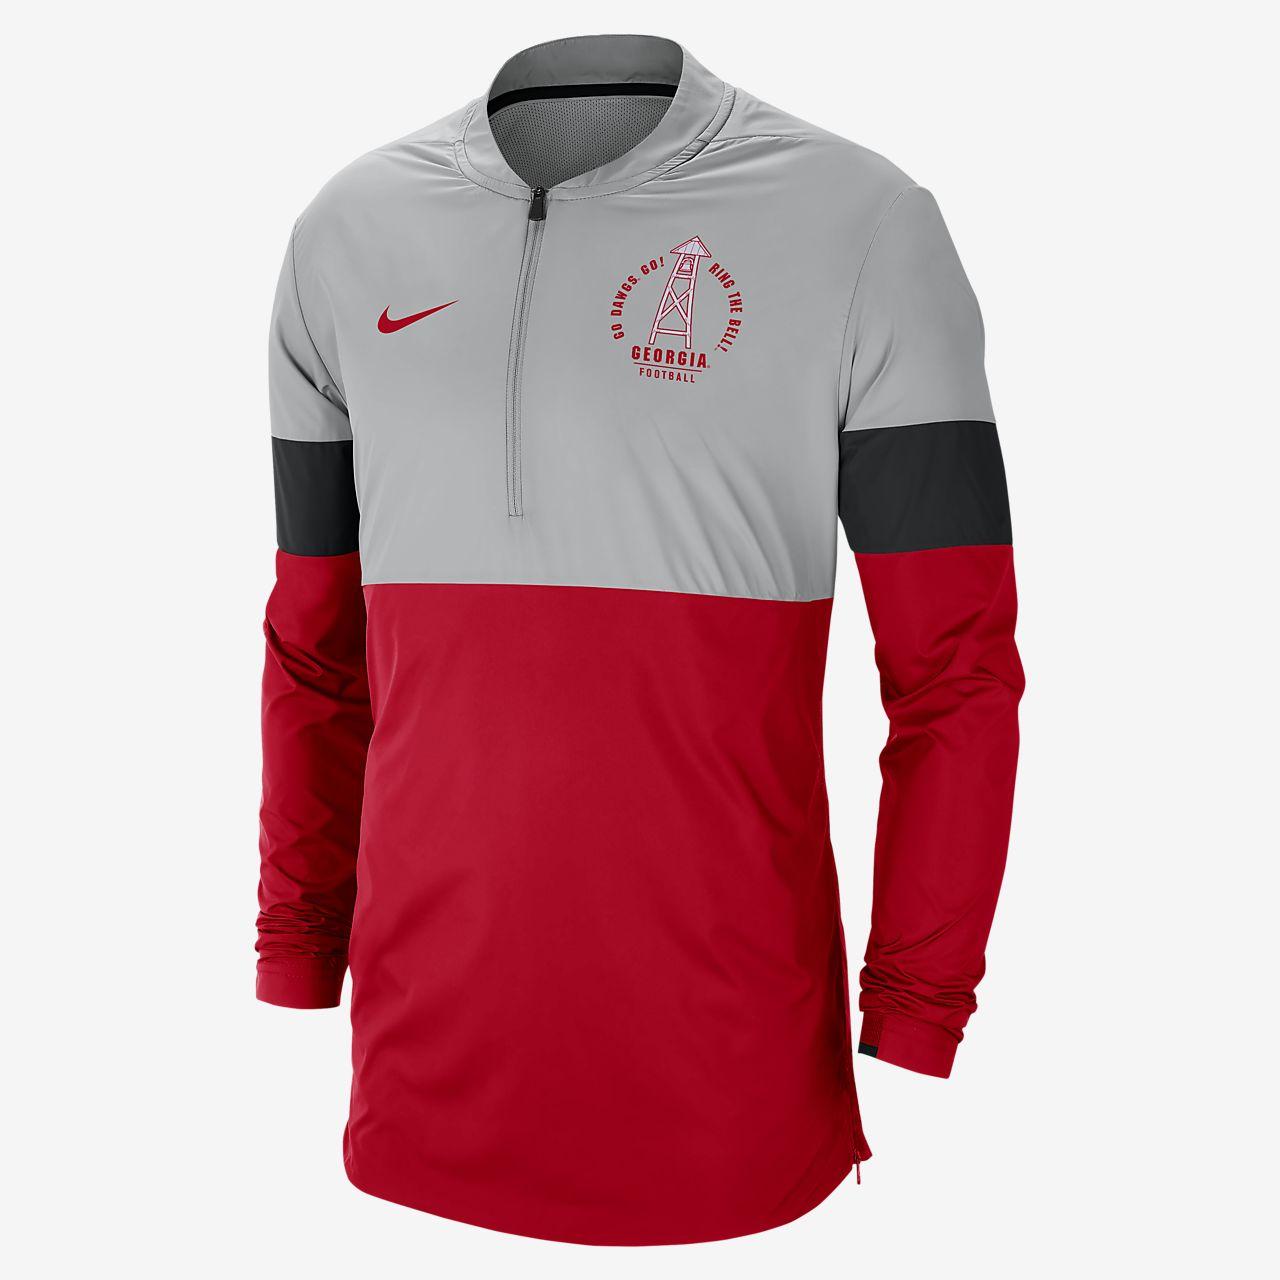 Nike College (Georgia) Men's Jacket